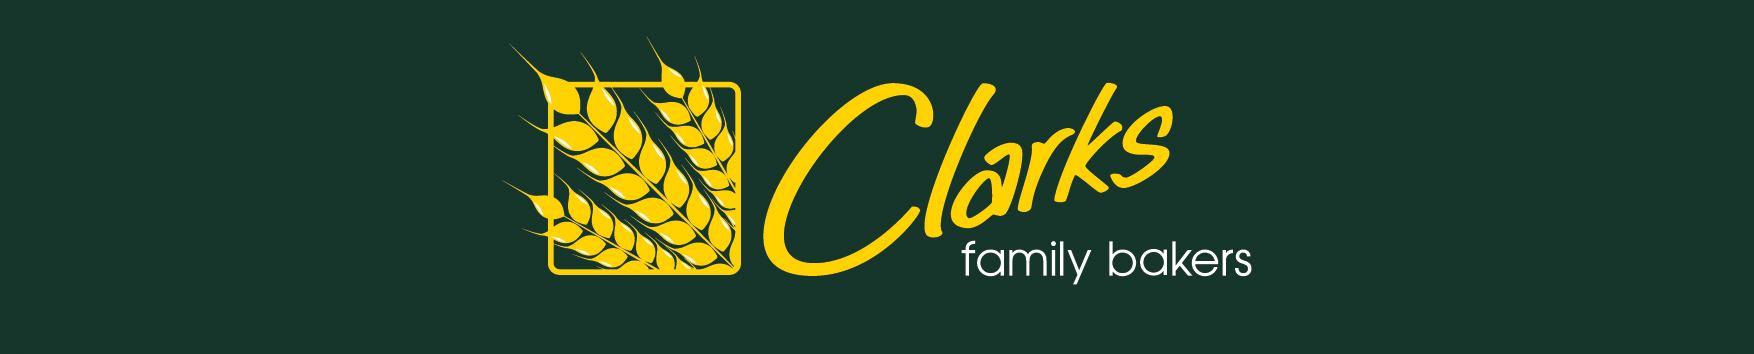 Clarks Bakers